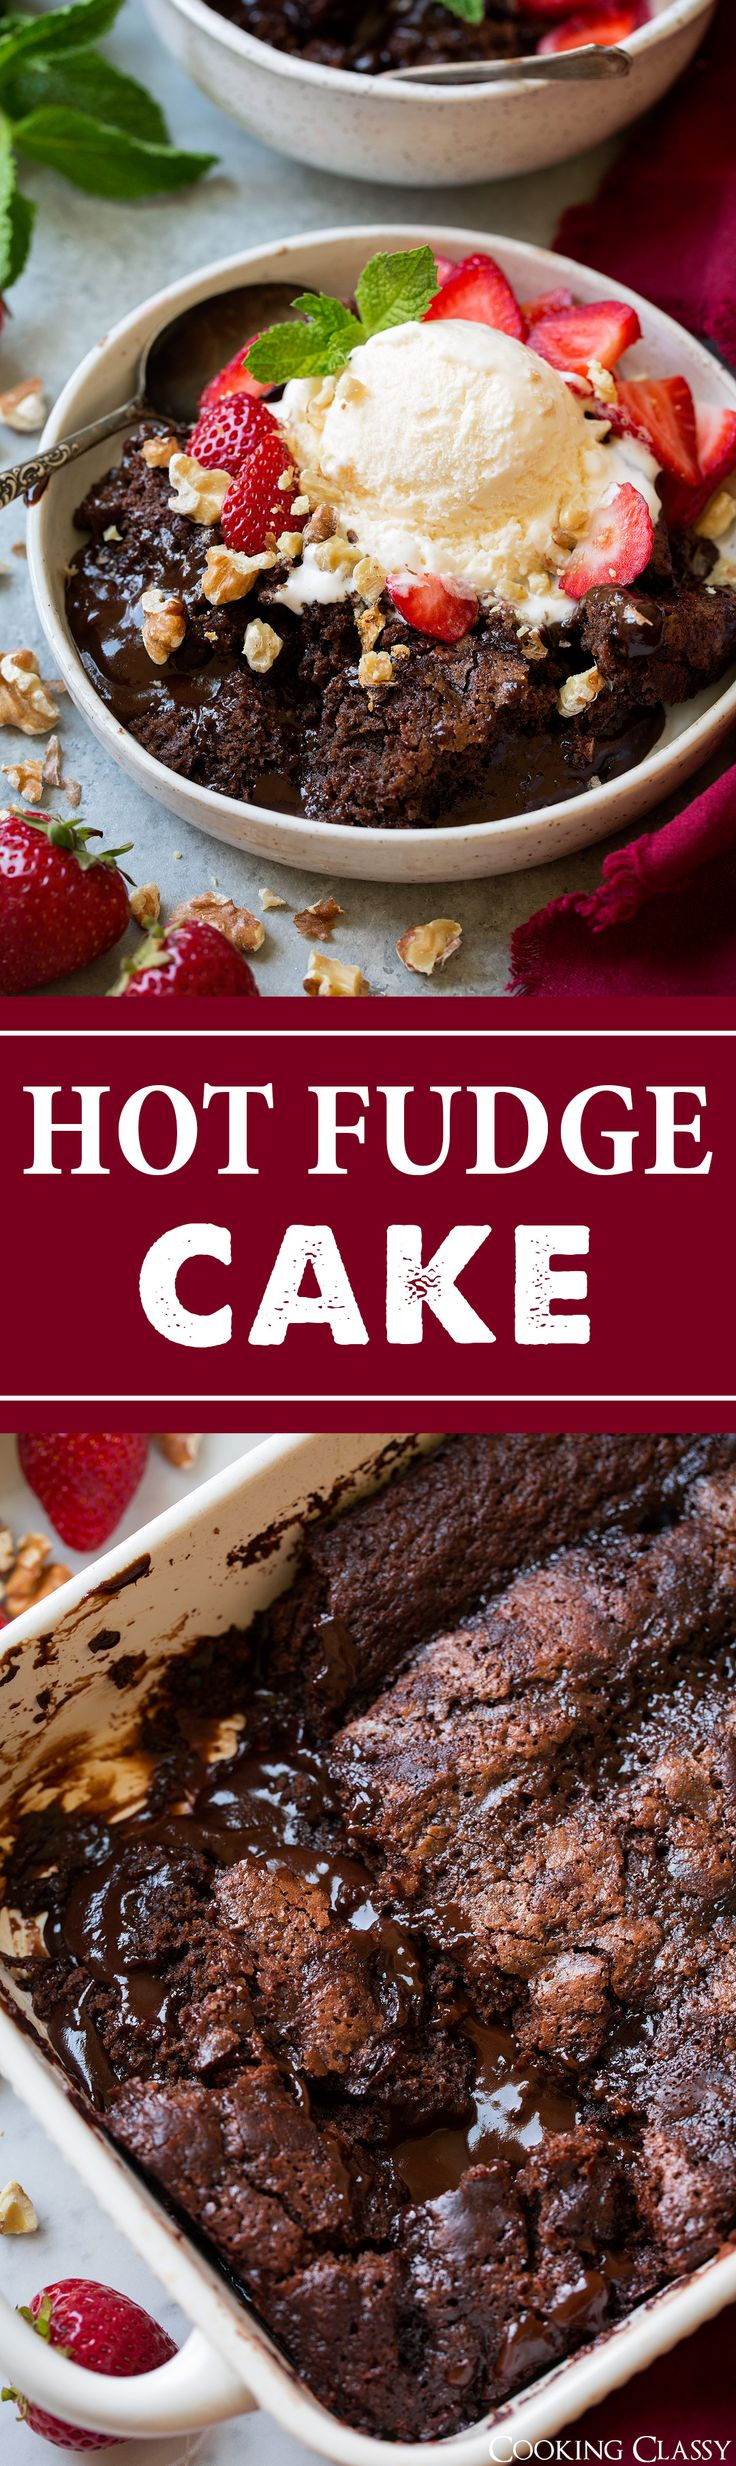 Hot Fudge Cake (AKA Chocolate Cobbler) - Cooking Classy